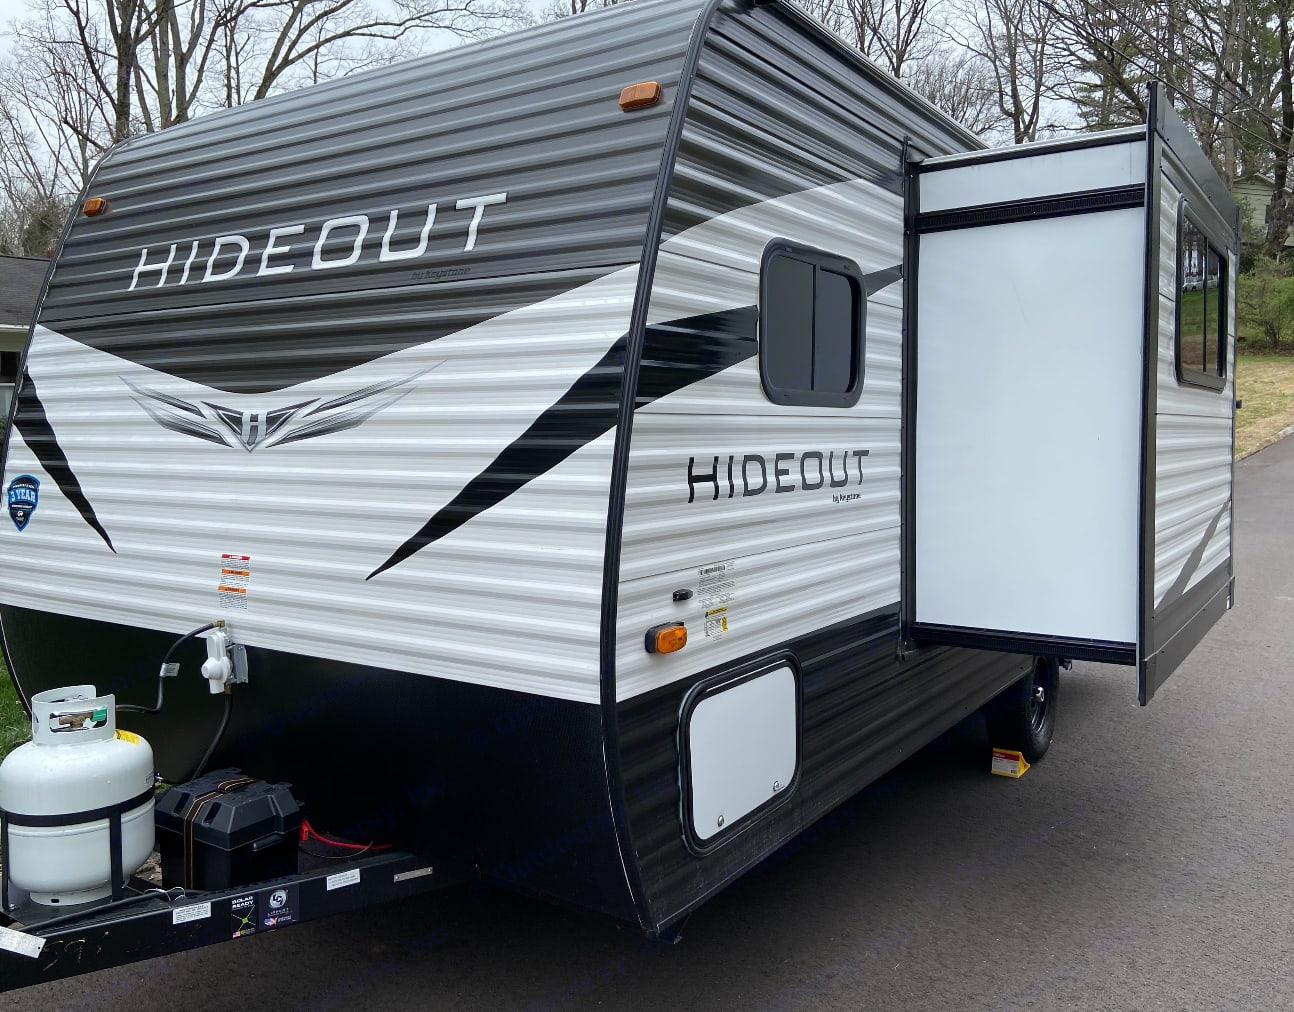 Lightweight and Roomy!. Keystone Hornet Hideout 2020